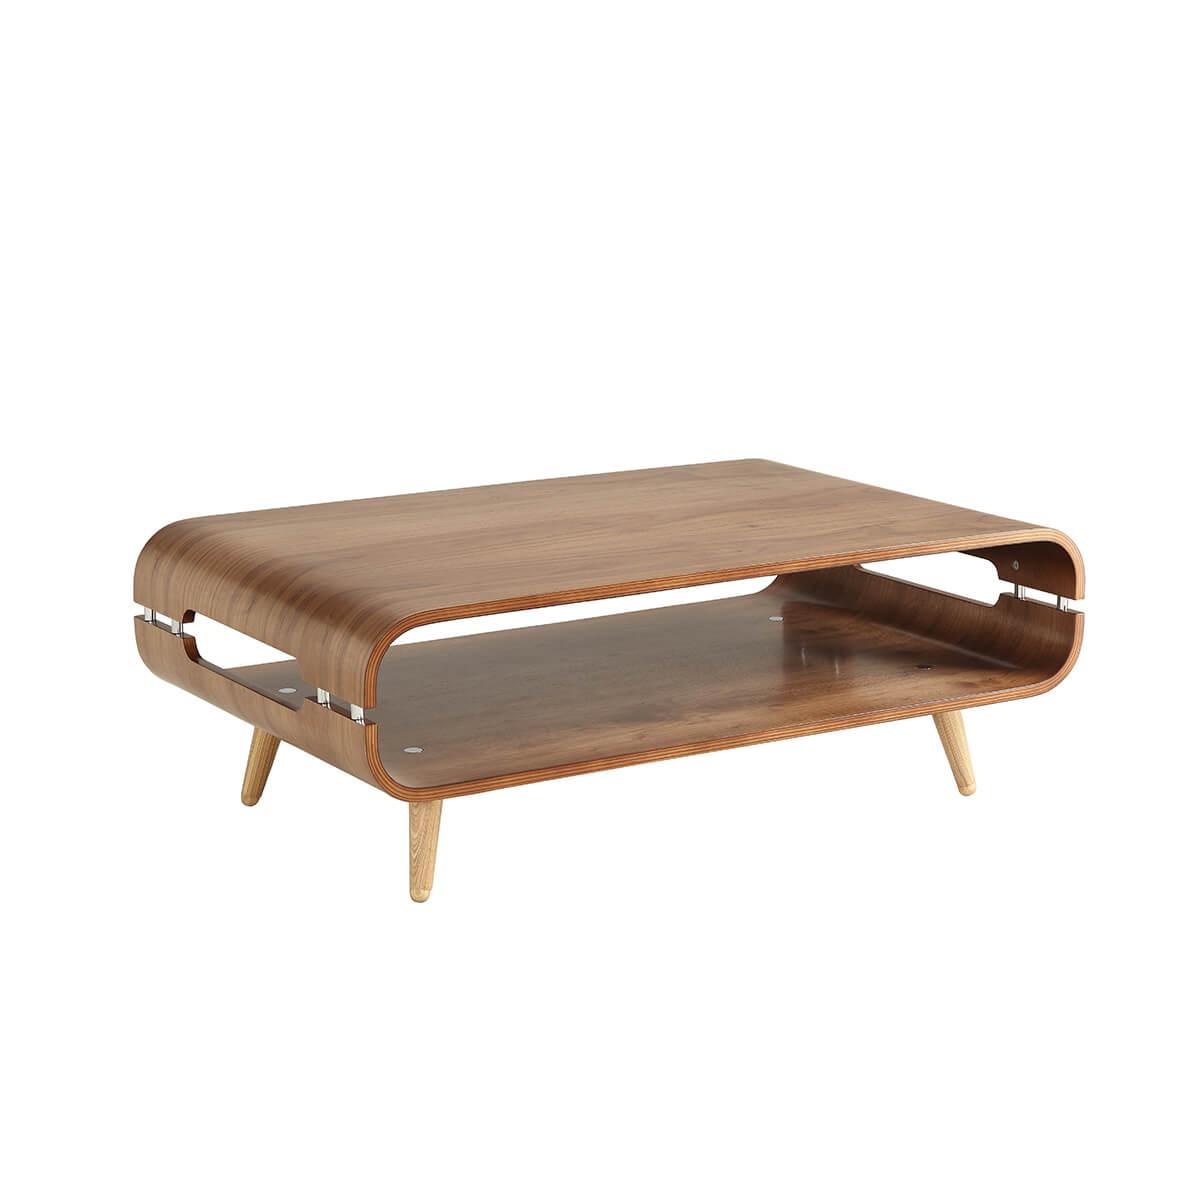 Jual Scandinavian Style Walnut Coffee Table Coffee Tables From Fads